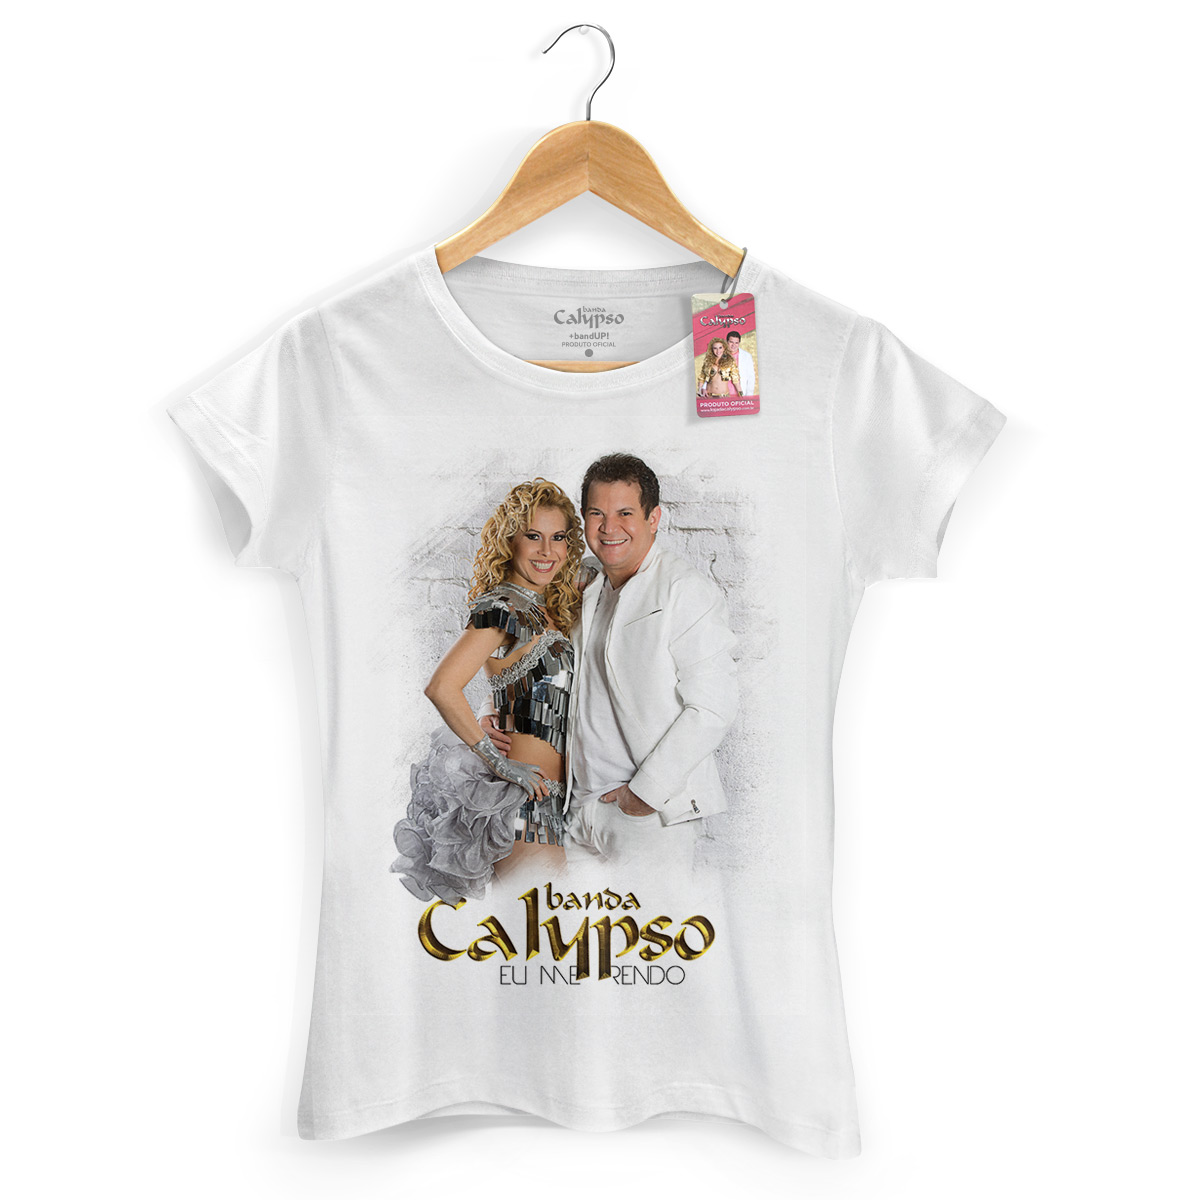 Camiseta Feminina Calypso - Capa